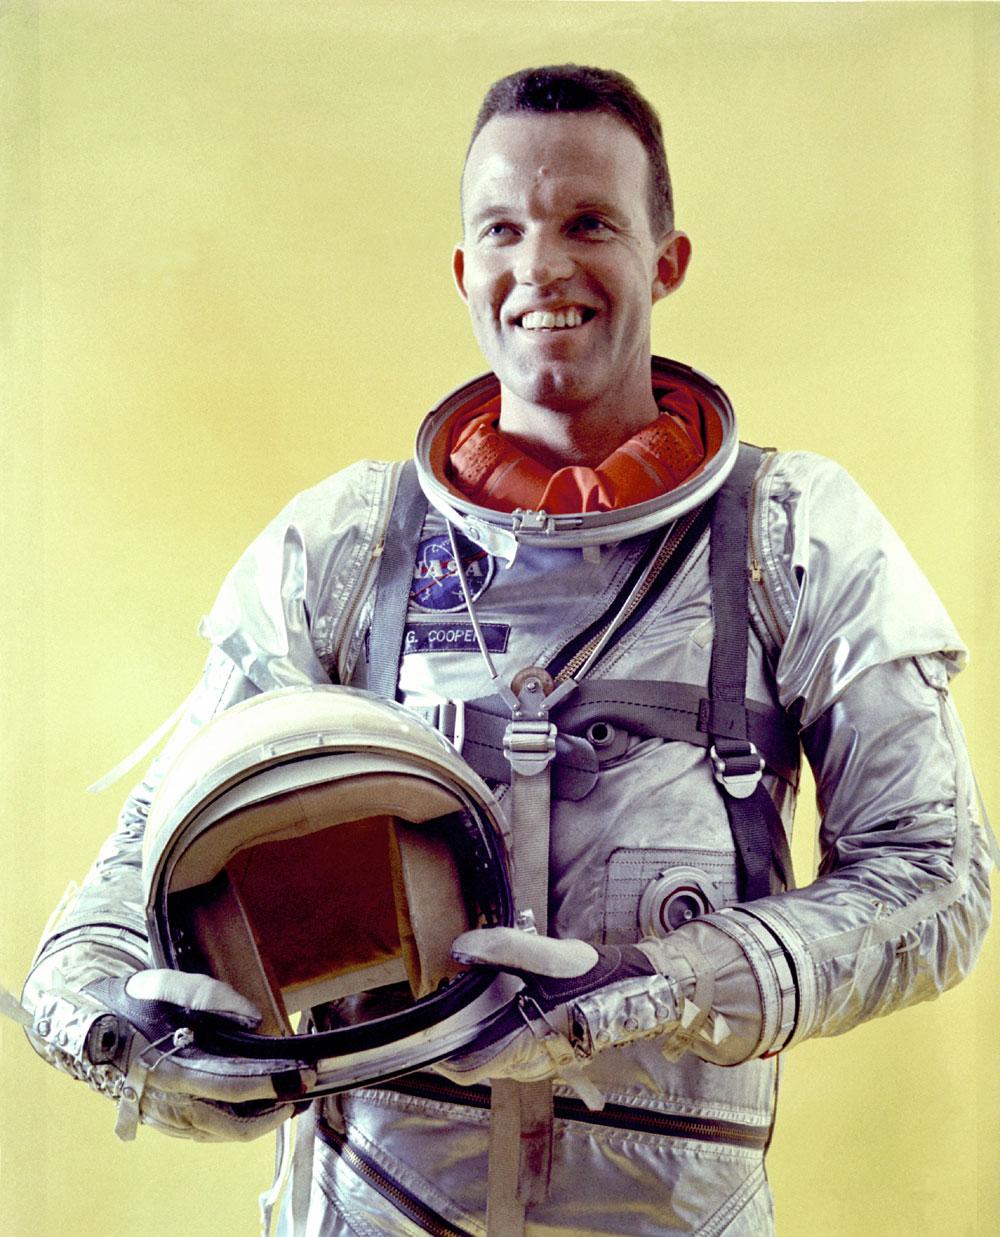 Gordon Cooper: Record-Setting Astronaut in Mercury & Gemini Programs